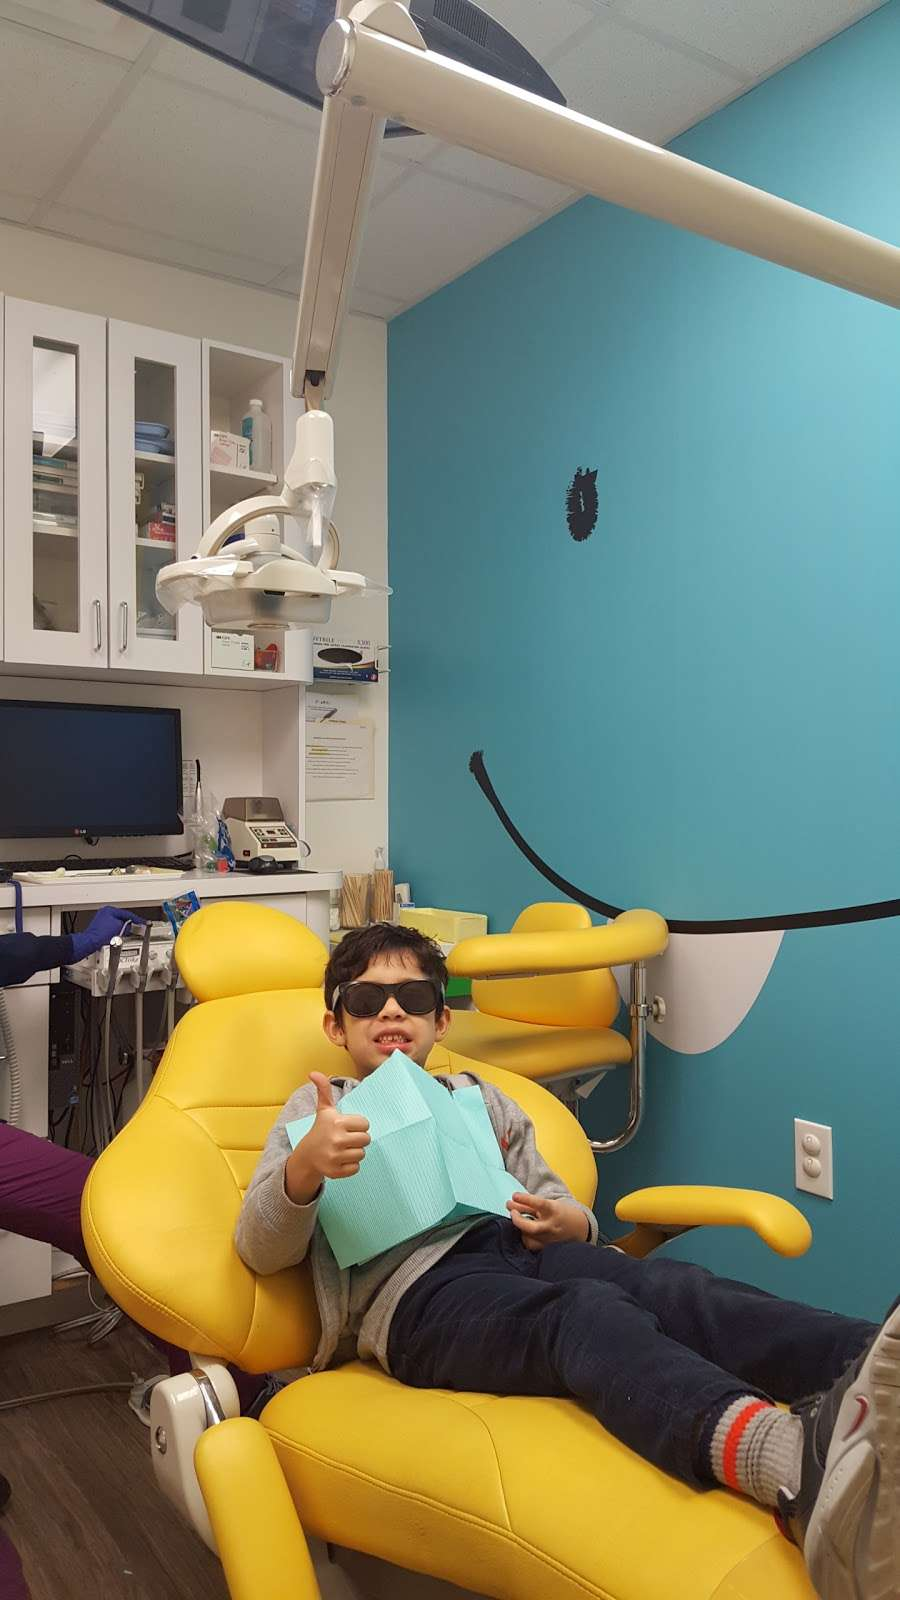 Bitesize Pediatric Dentistry - dentist  | Photo 5 of 10 | Address: 568 Union Ave, Brooklyn, NY 11211, USA | Phone: (718) 899-4500